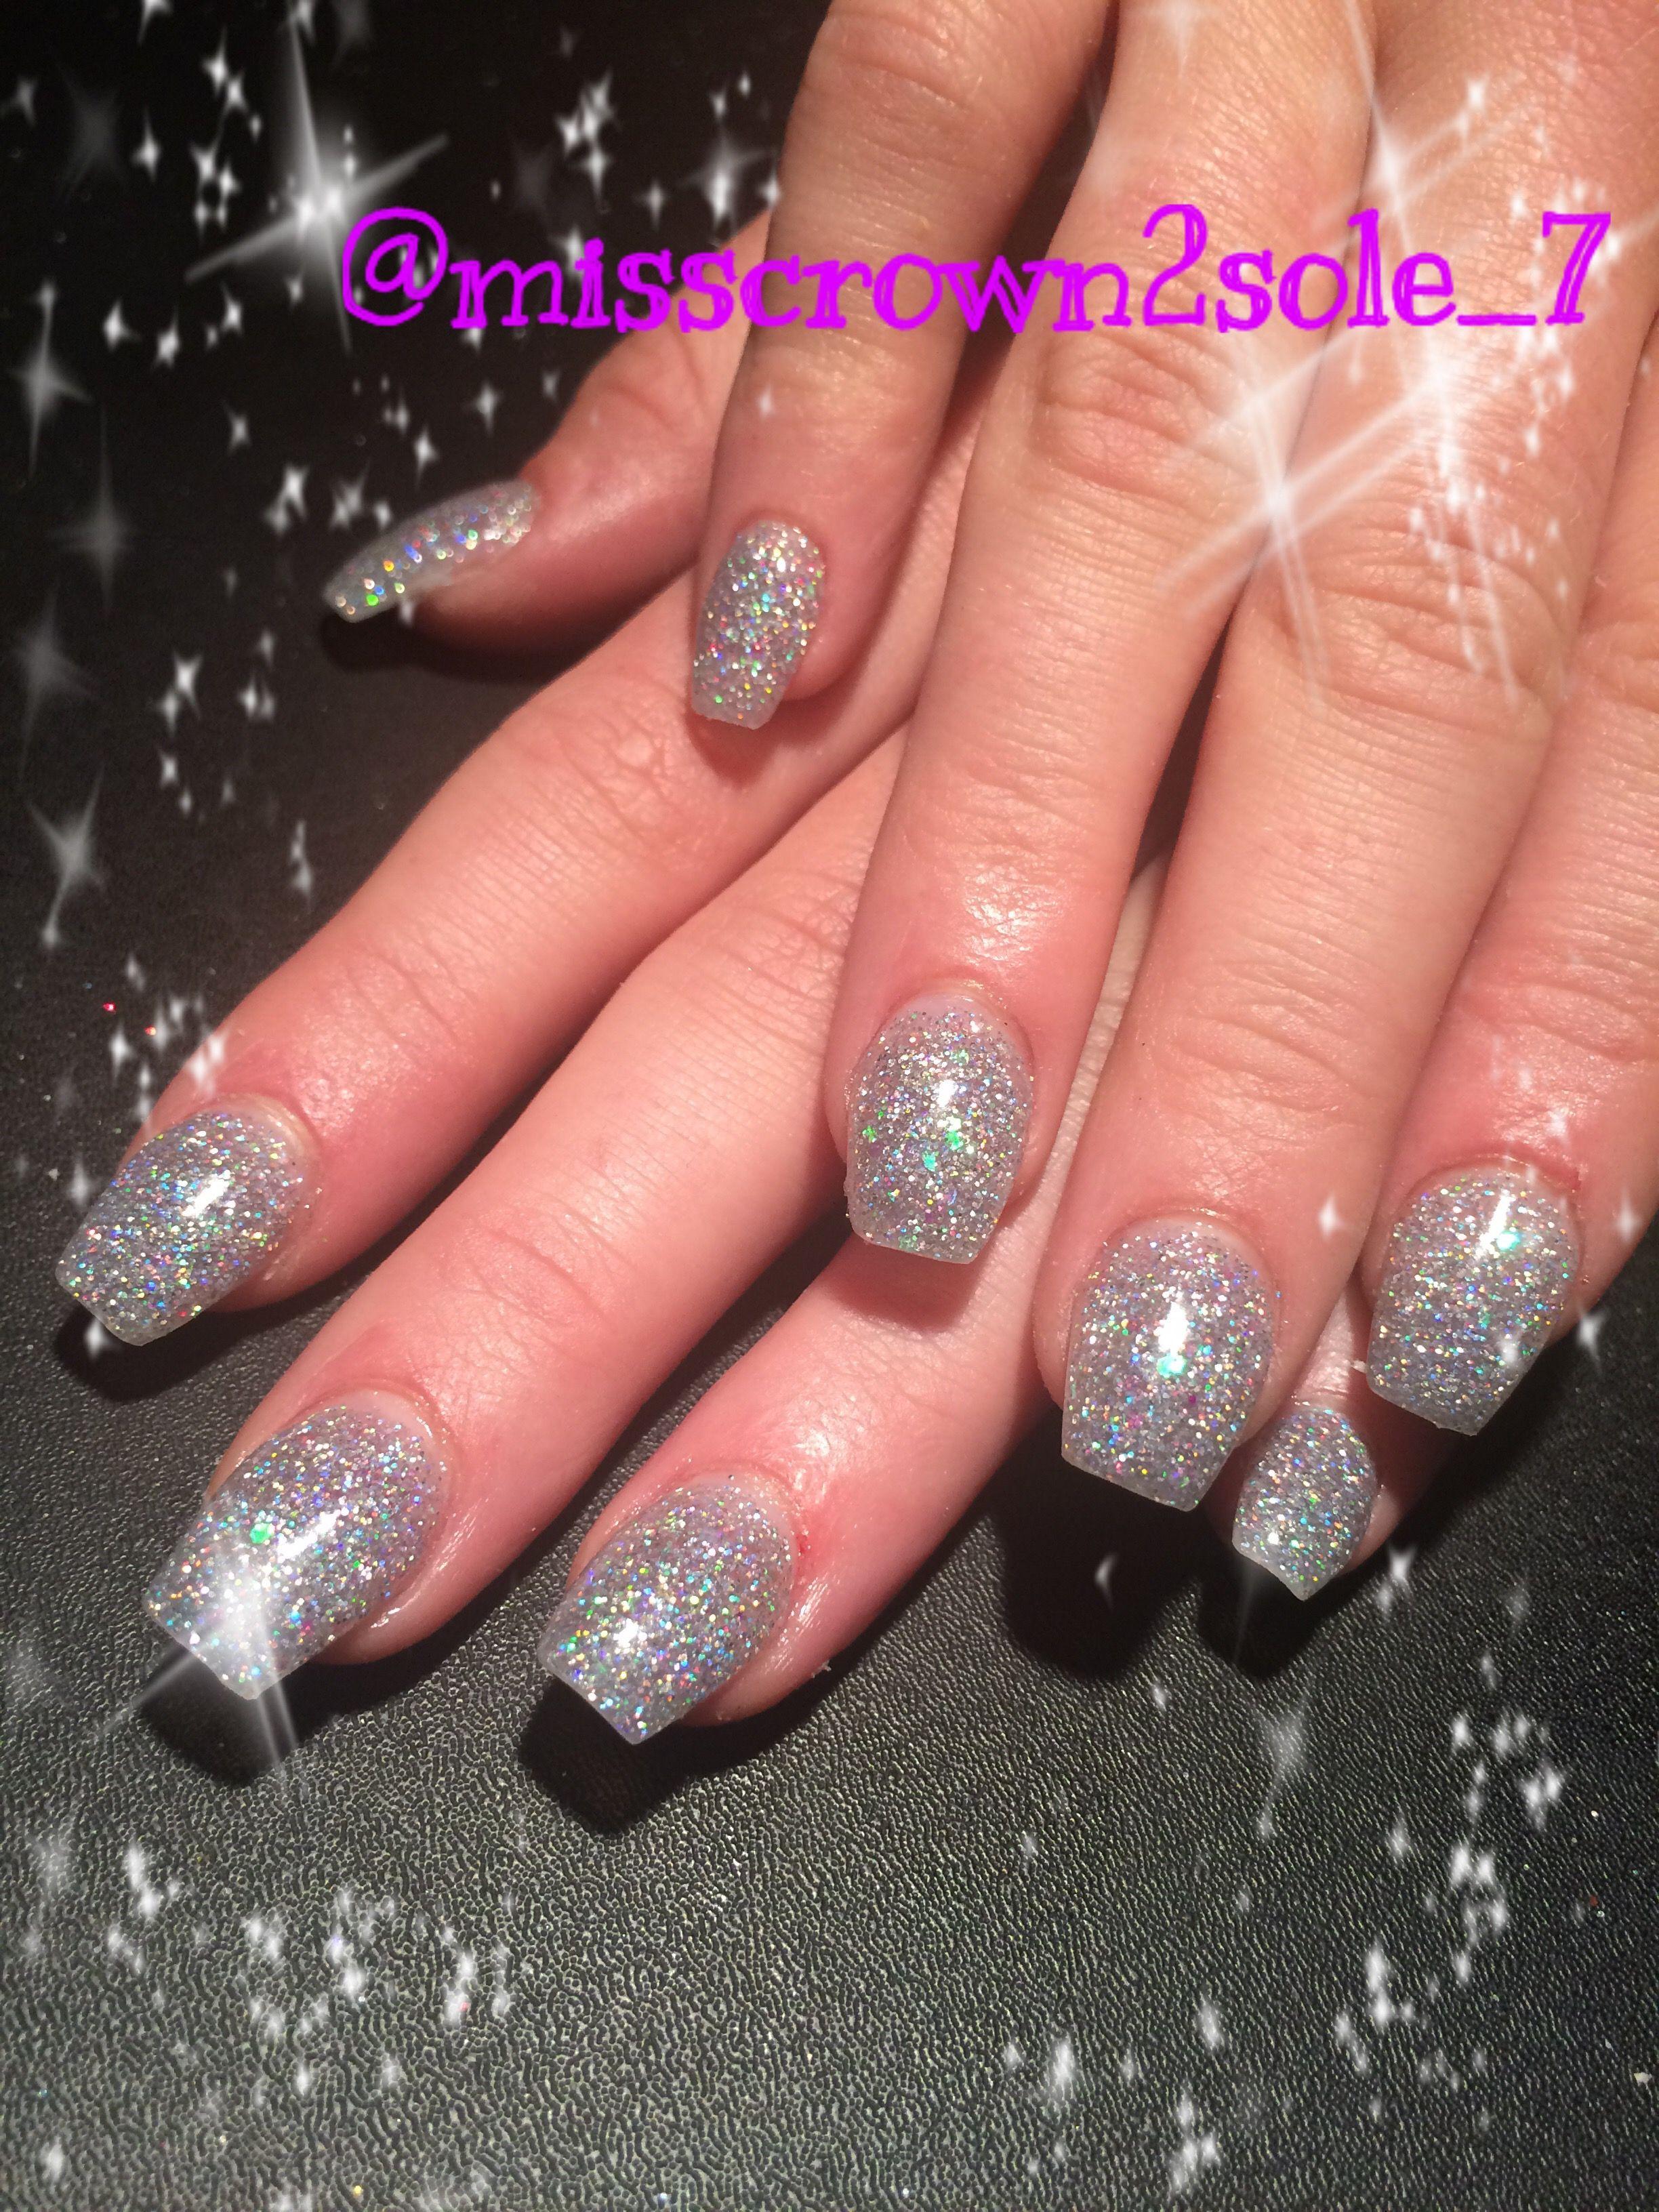 Pink and silver nails - Prom Nails Acrylic Nails Custom Glitter Nails Silver Nails Sparkle Shine Short Coffin Nails